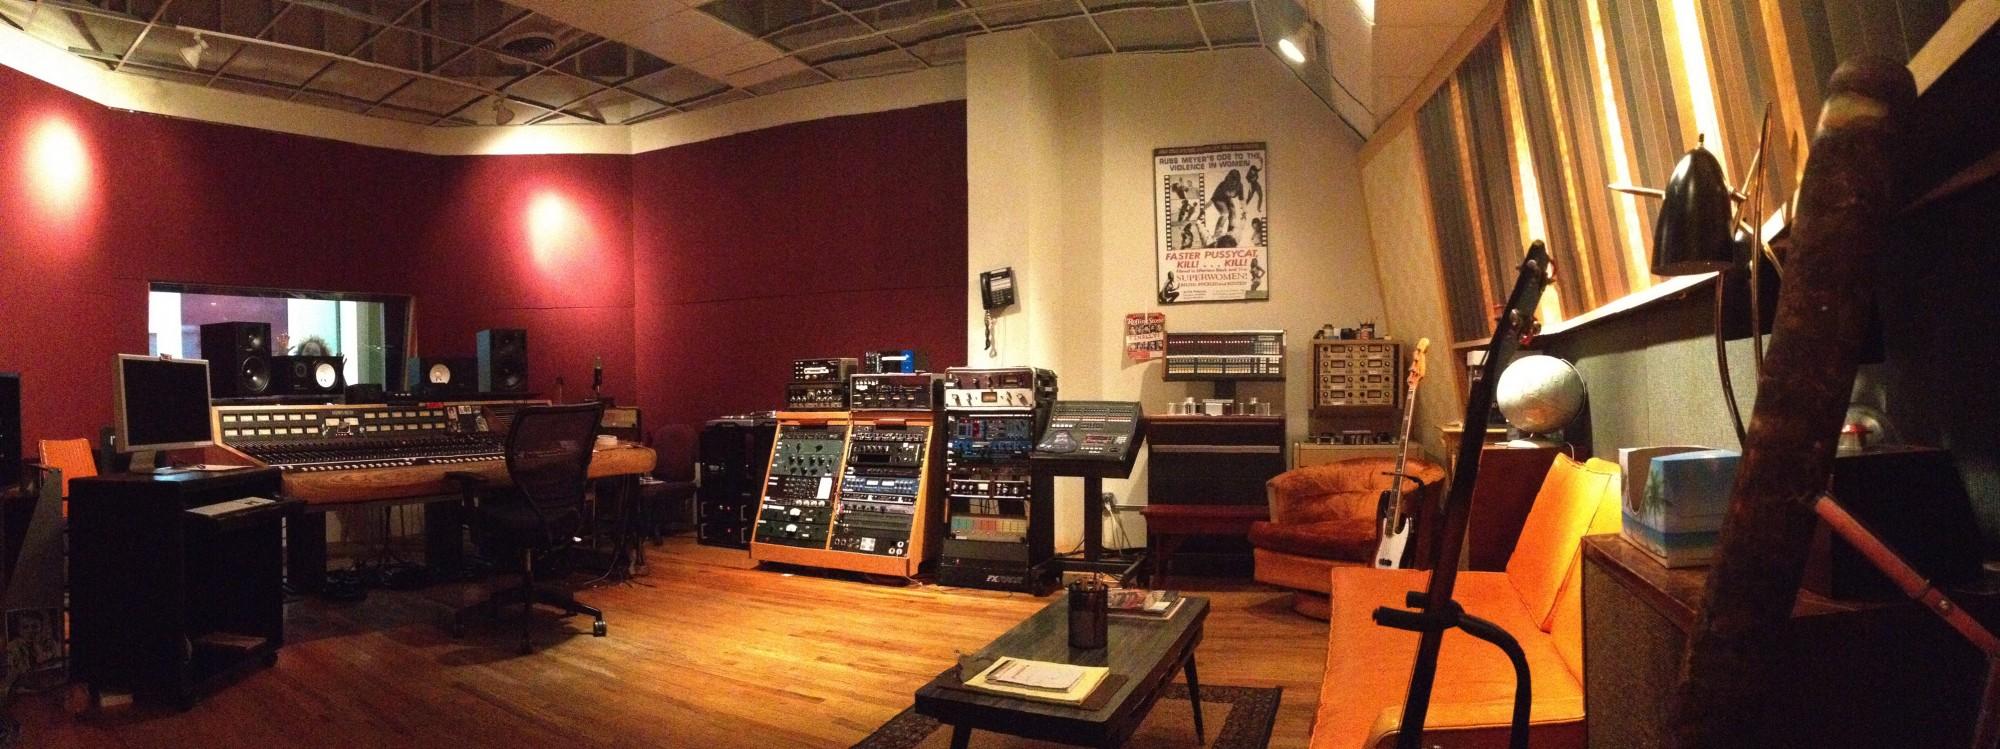 Studio B's Control Room